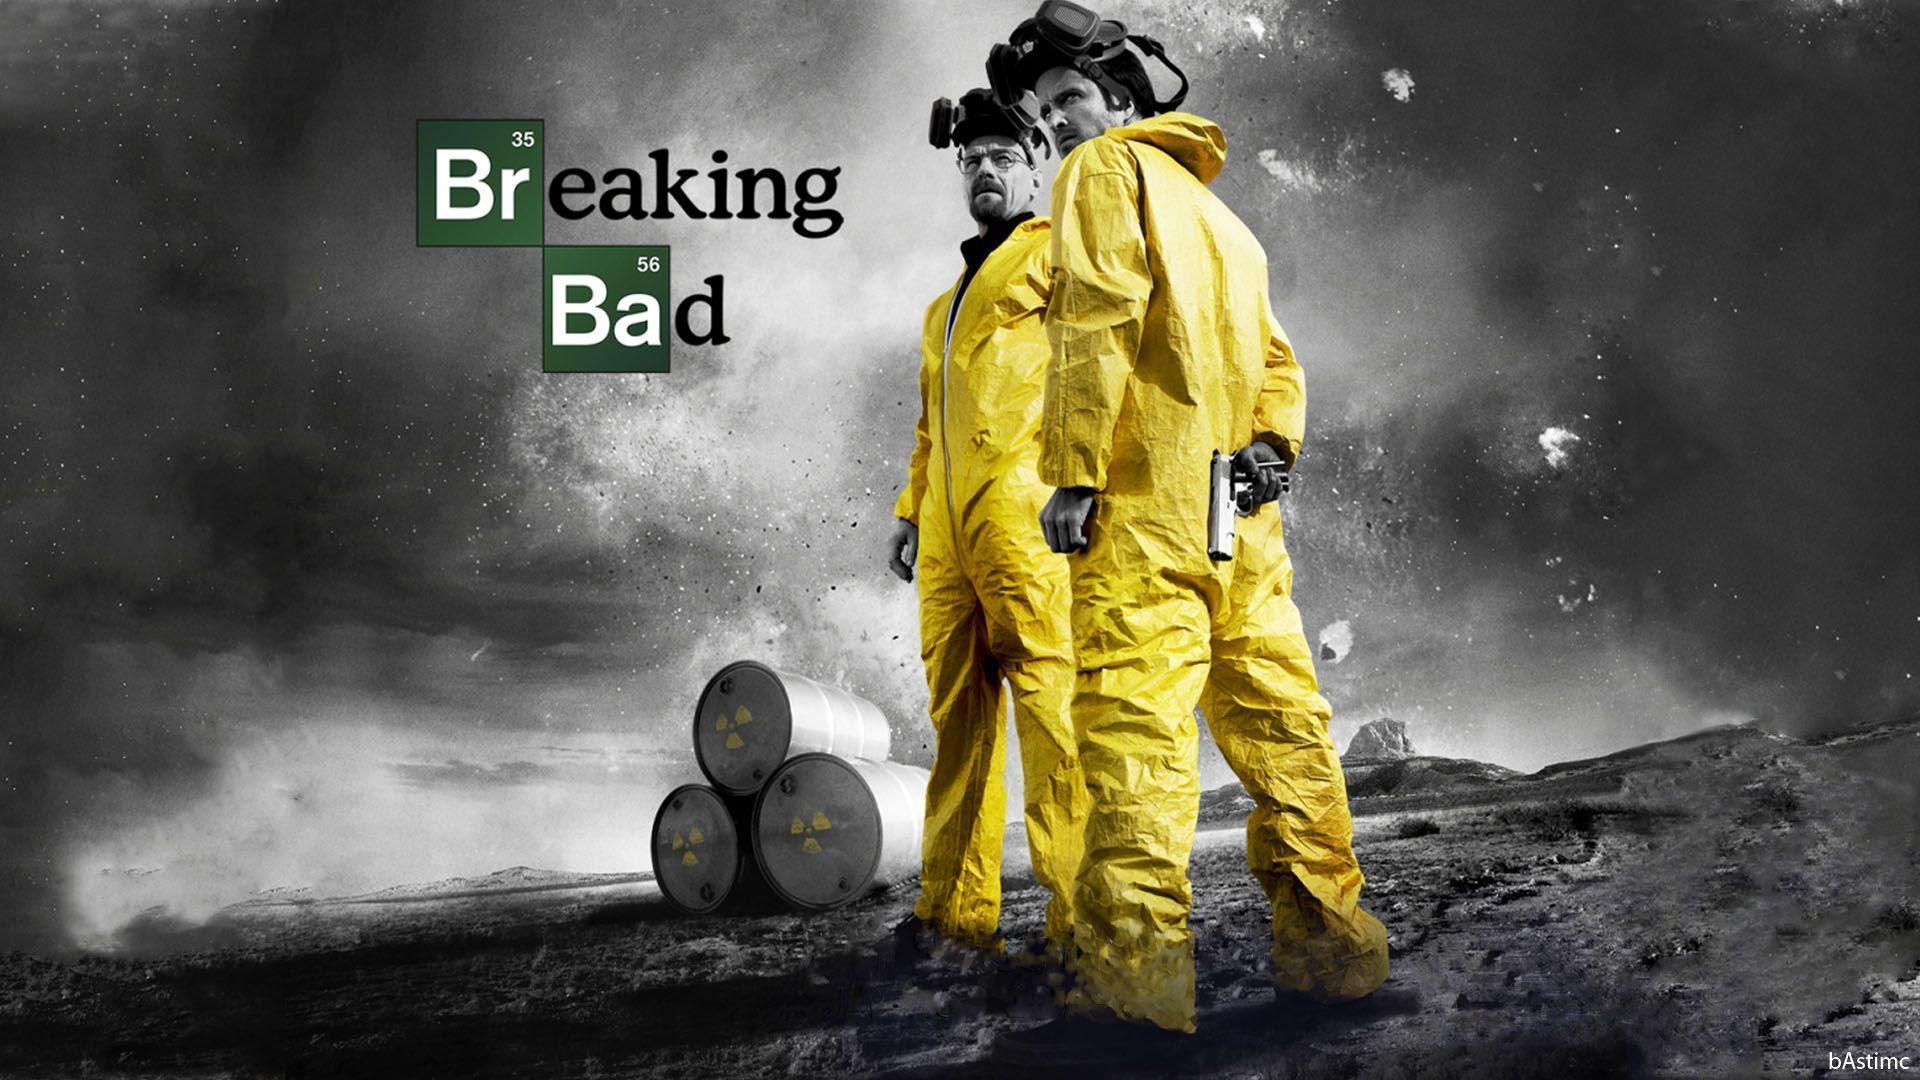 Fondos hd breaking bad